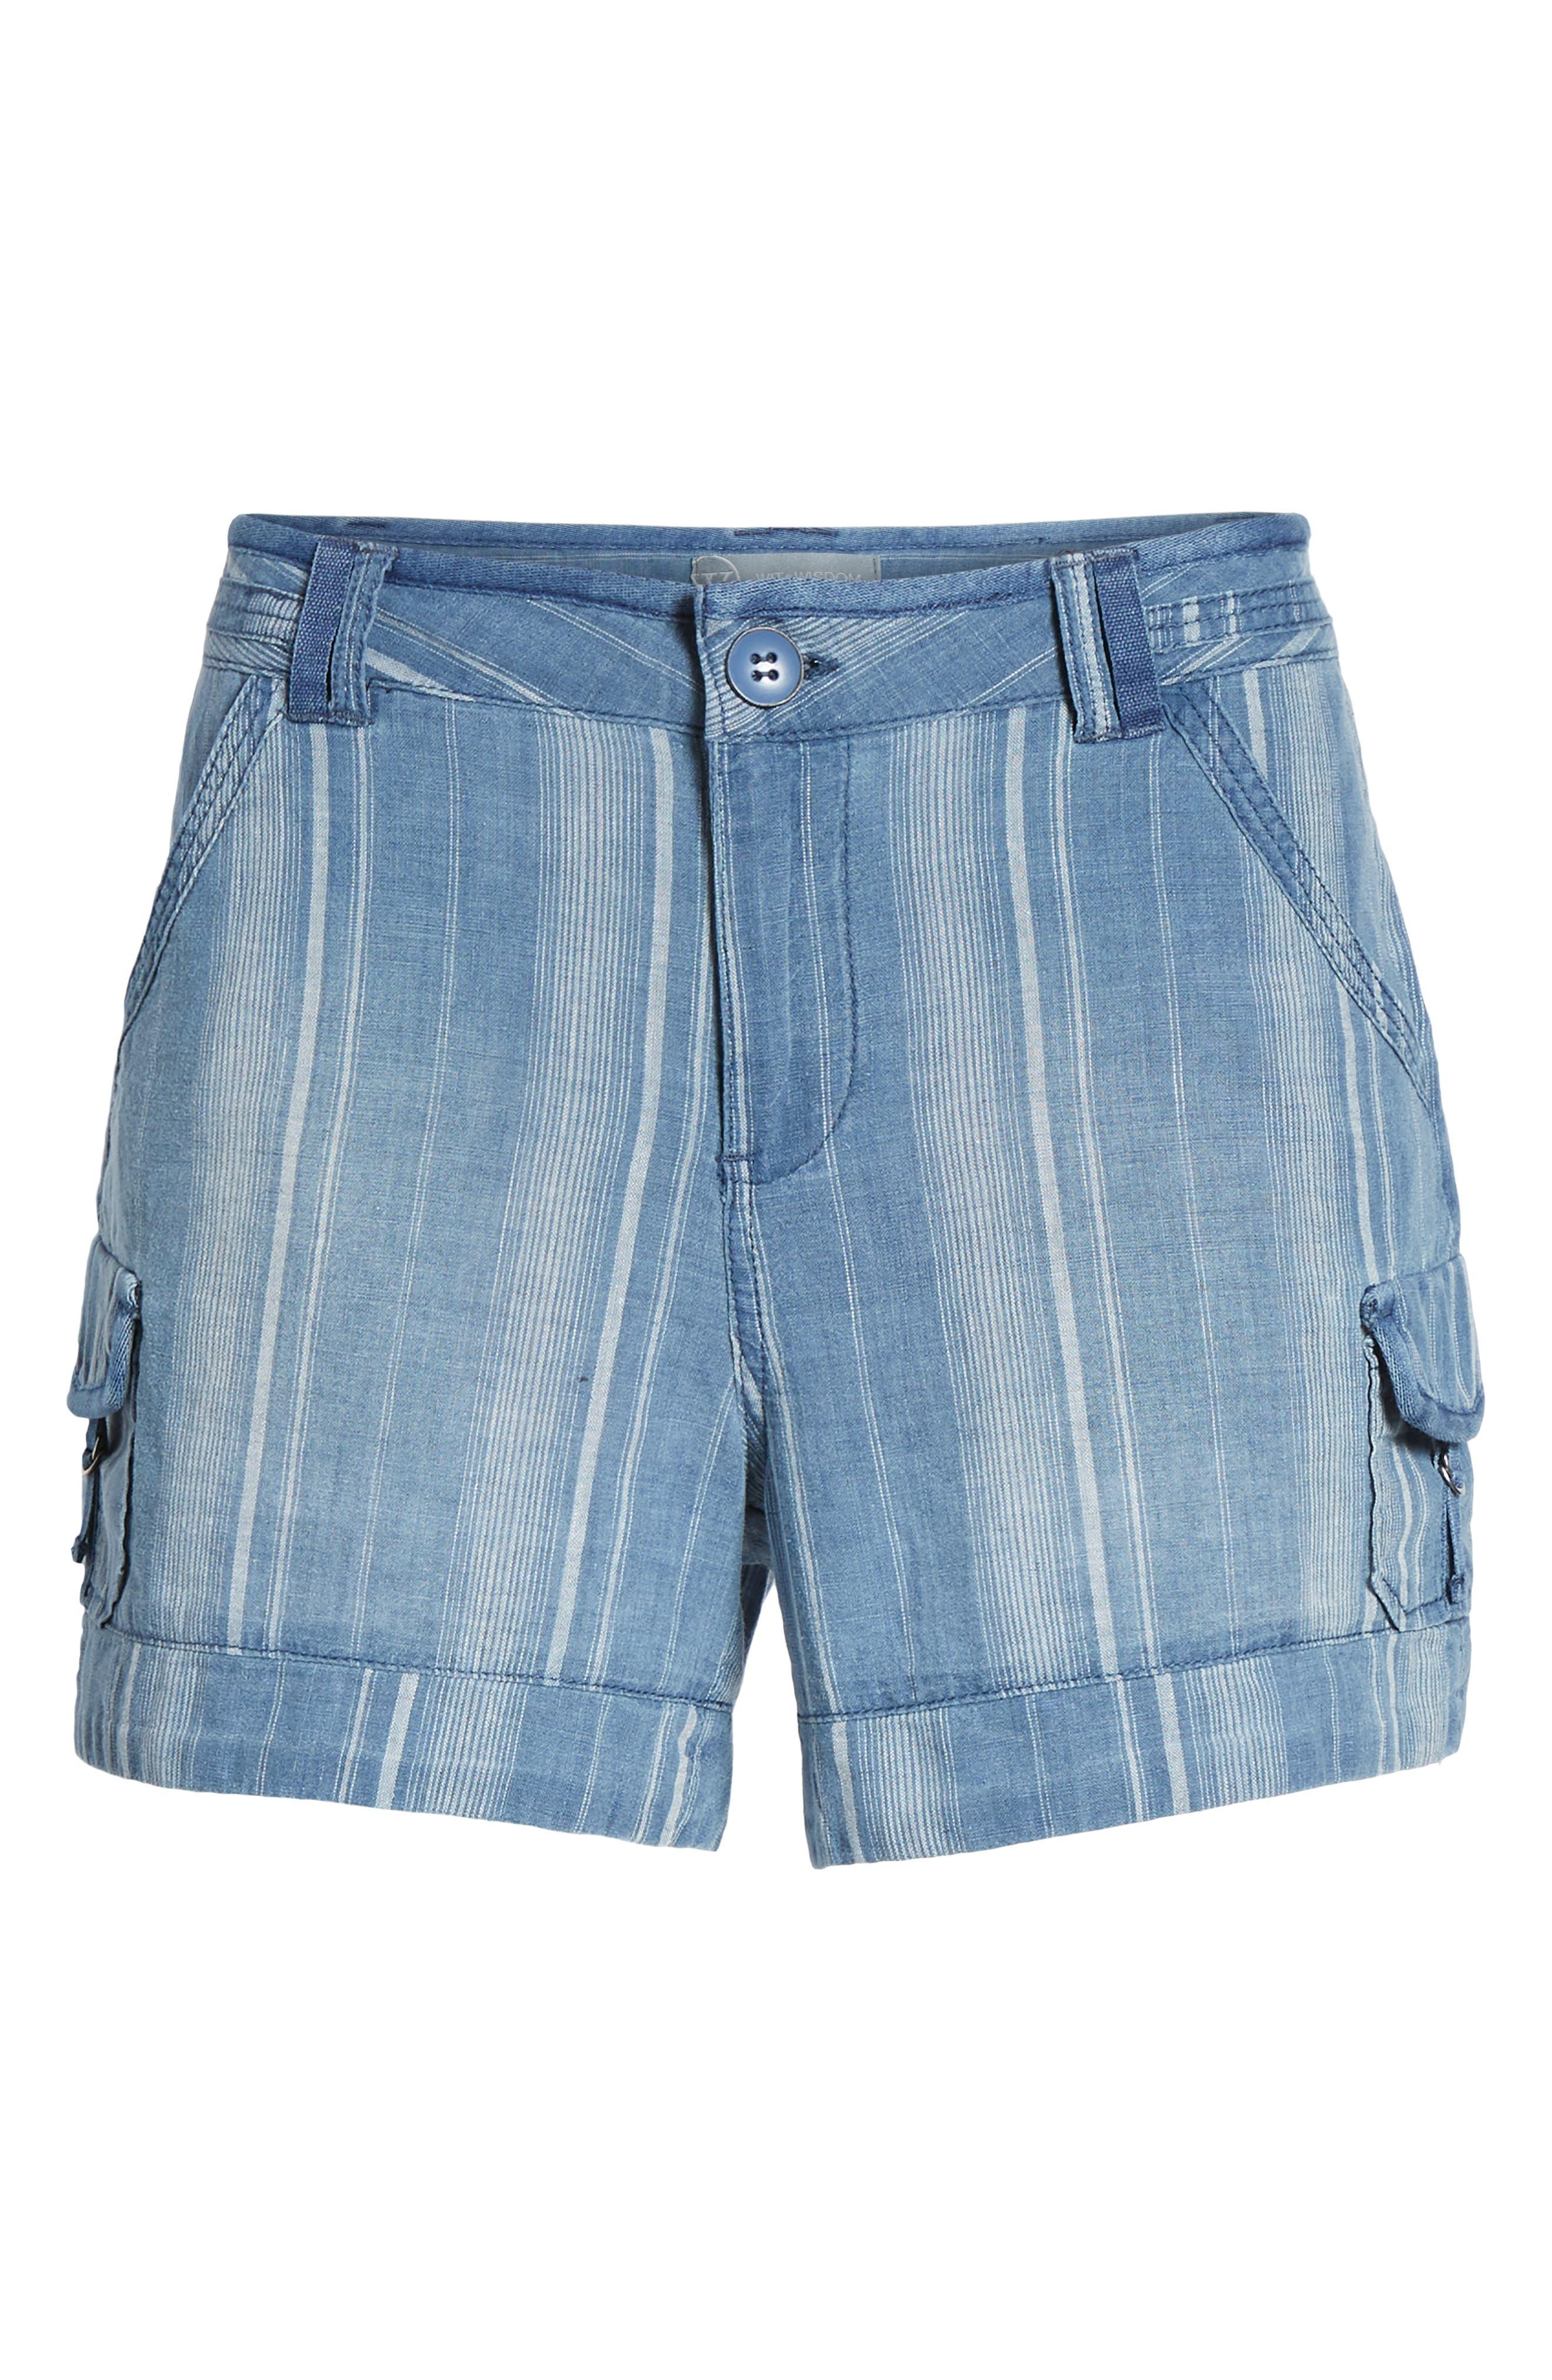 High Rise Striped Shorts,                             Alternate thumbnail 7, color,                             420